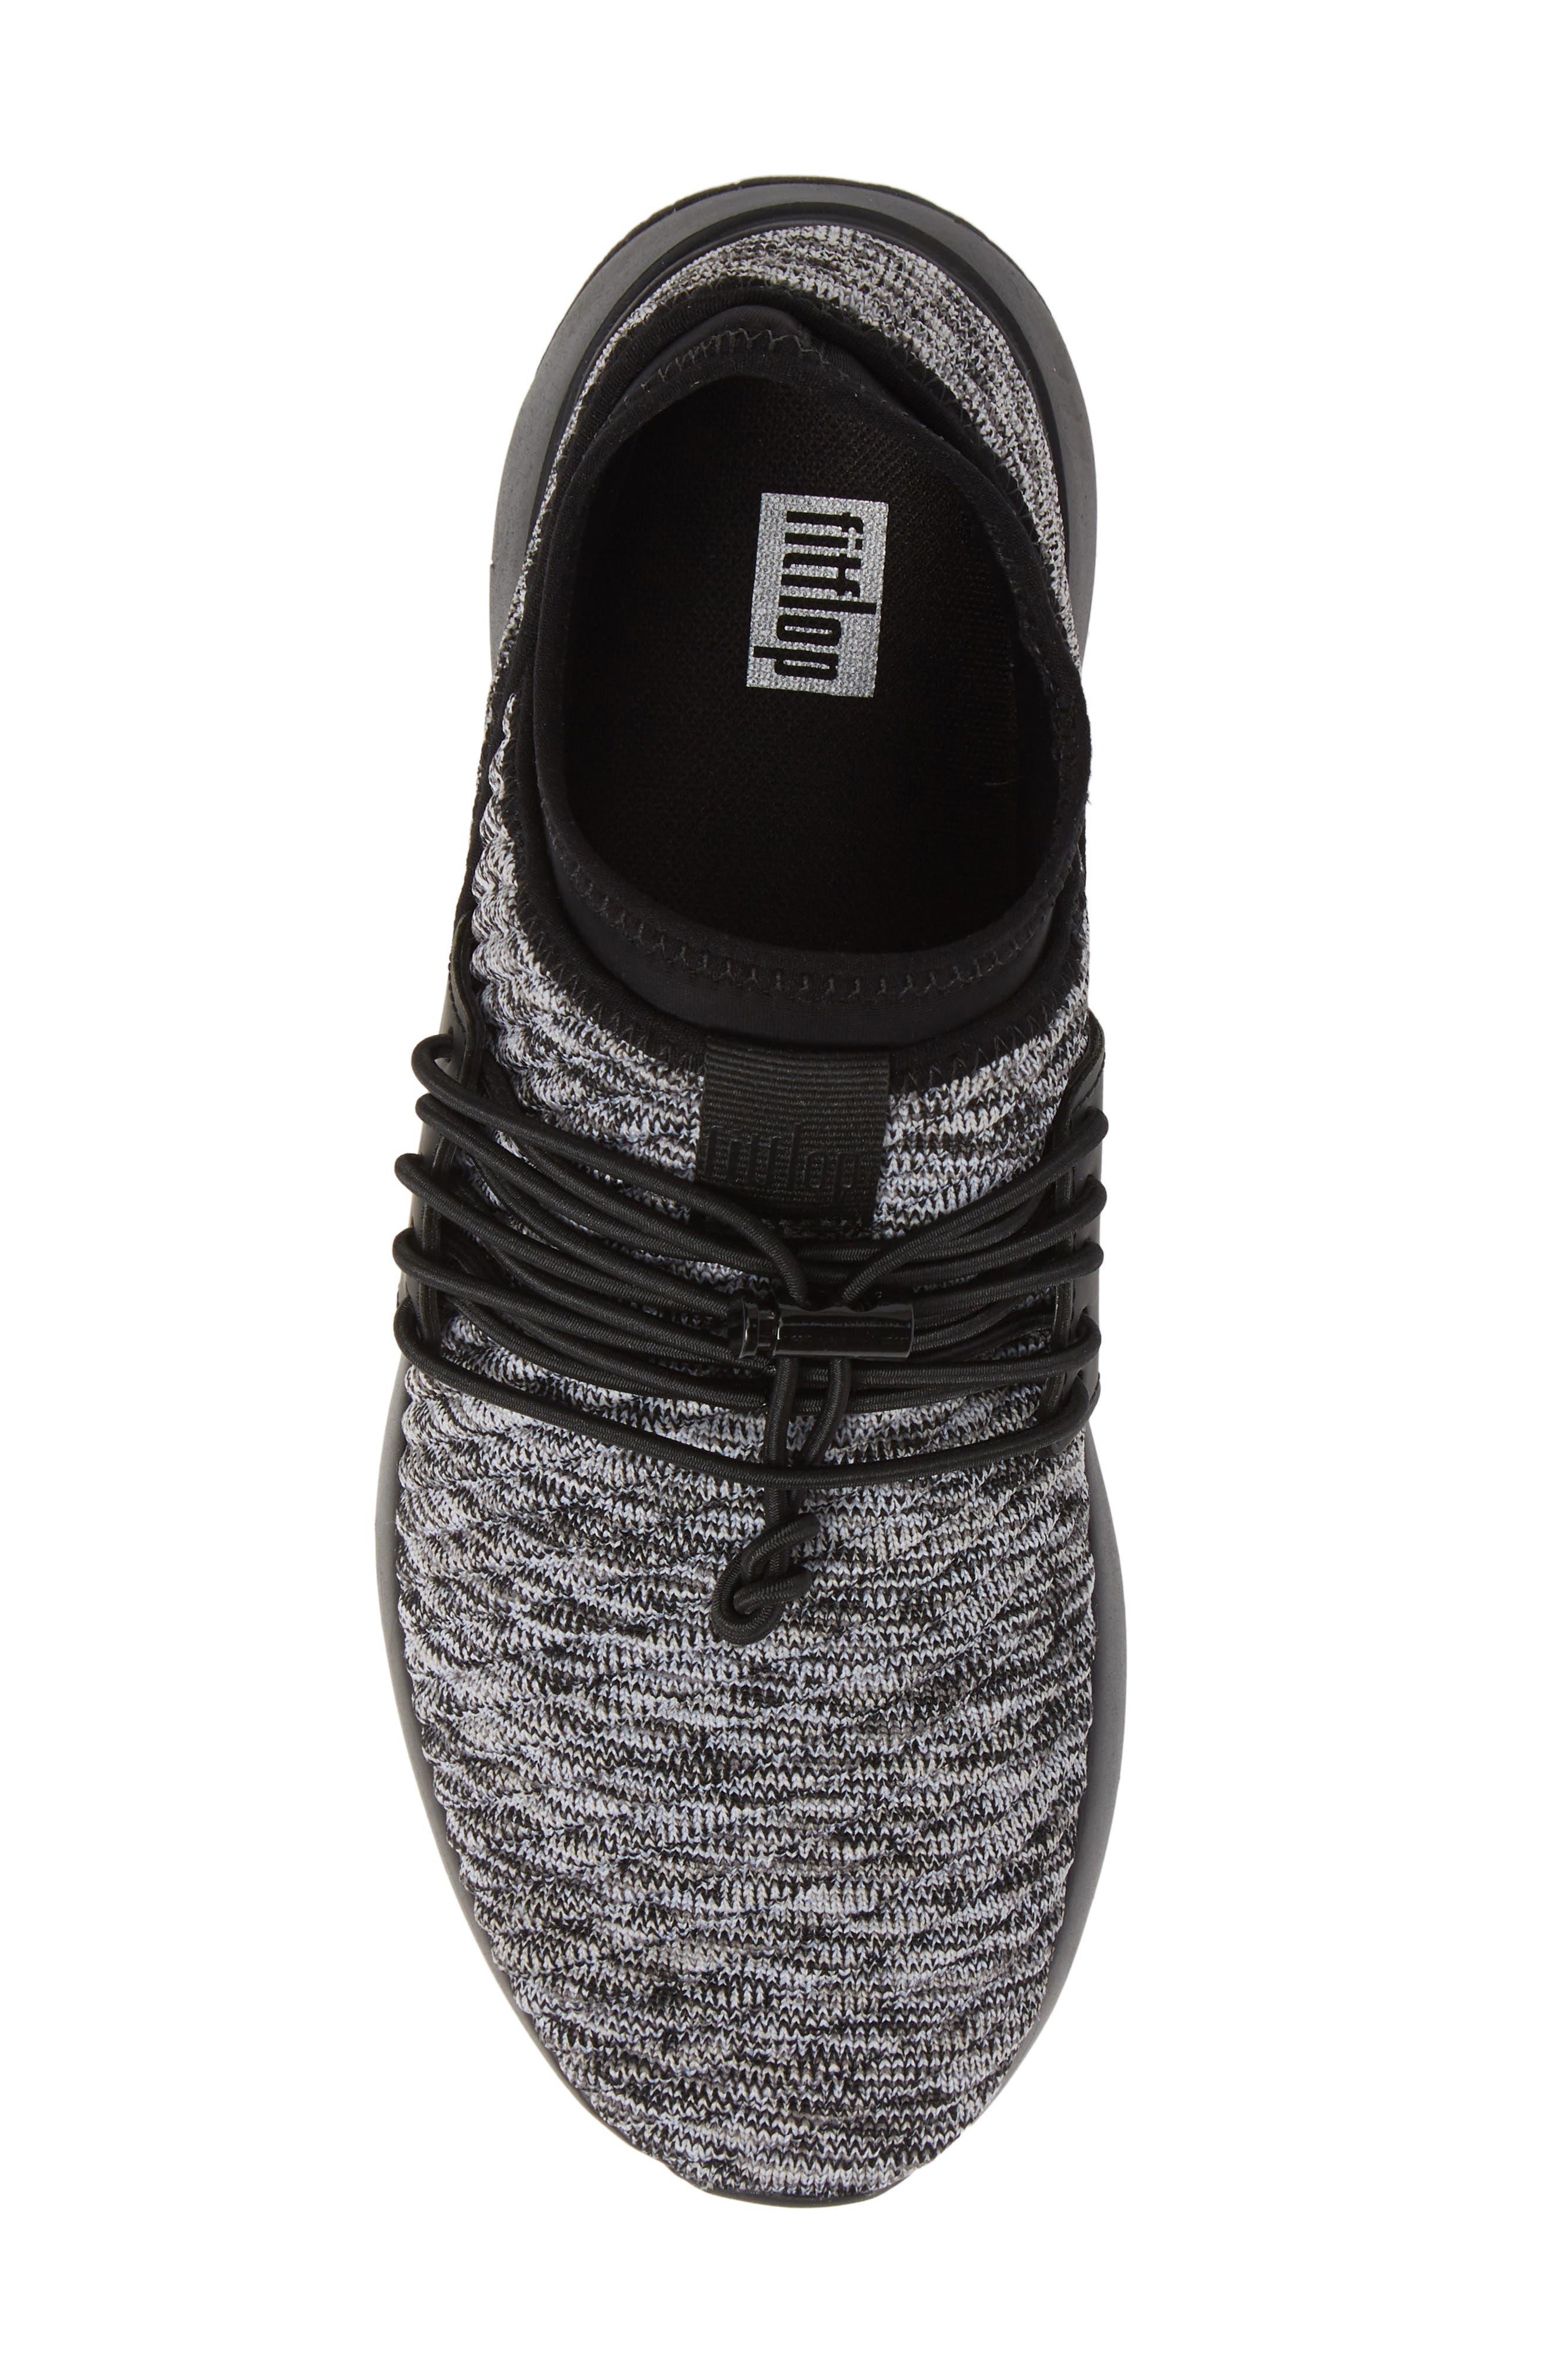 FITFLOP, Artknit Sock Sneaker, Alternate thumbnail 5, color, 017